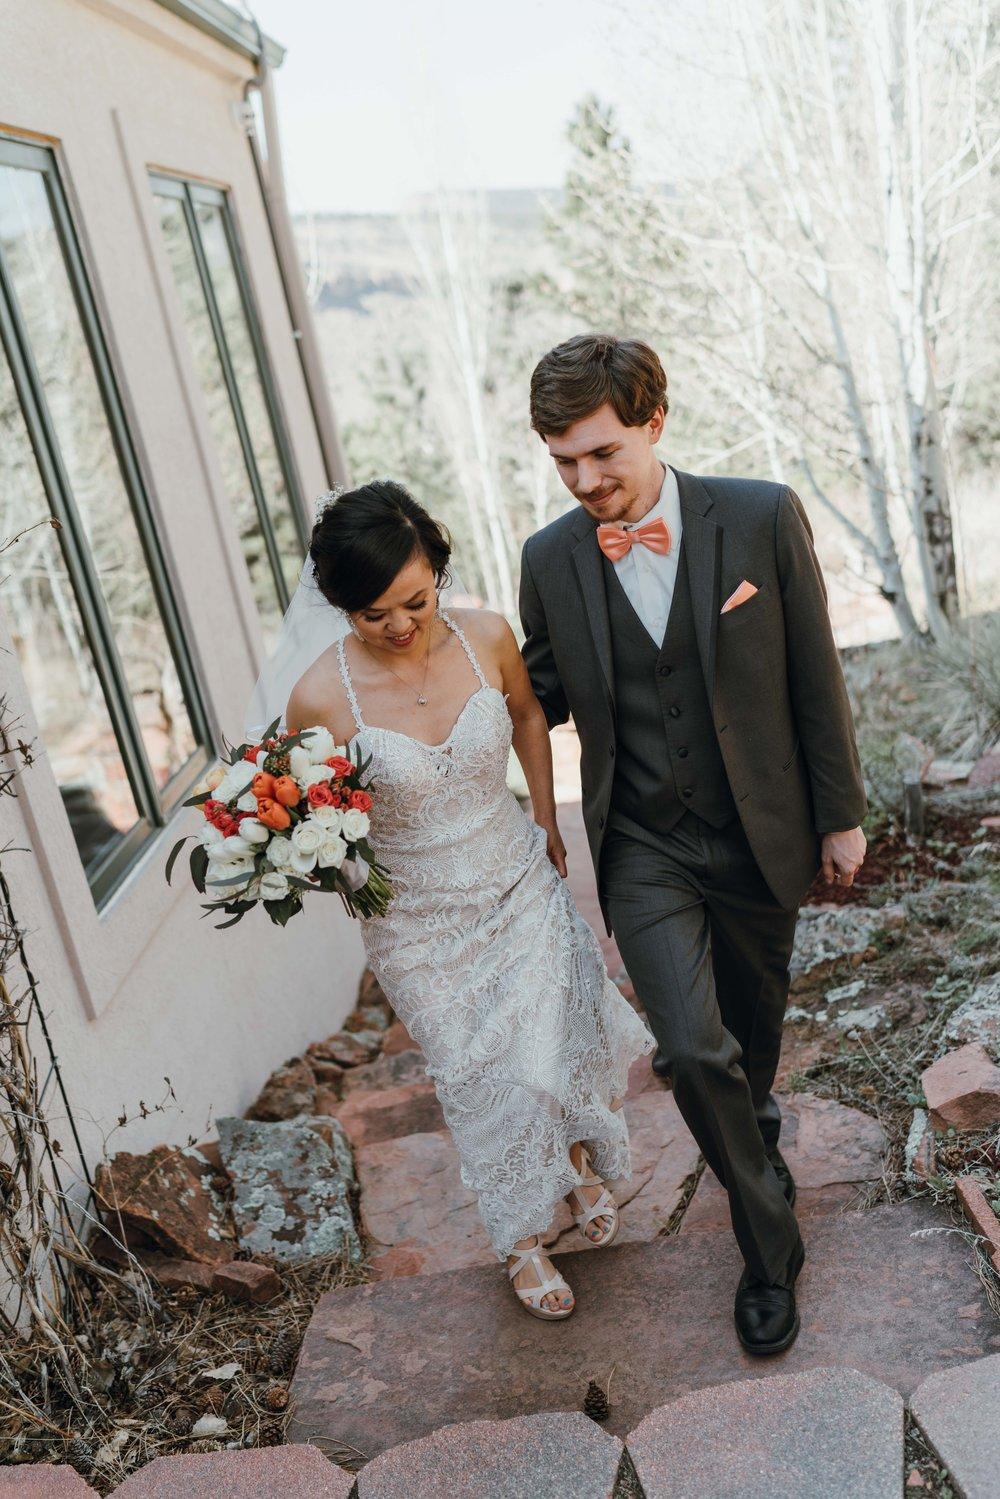 denver wedding photographer lioncrest manor in lyons ben and mali -DSC06105.jpg